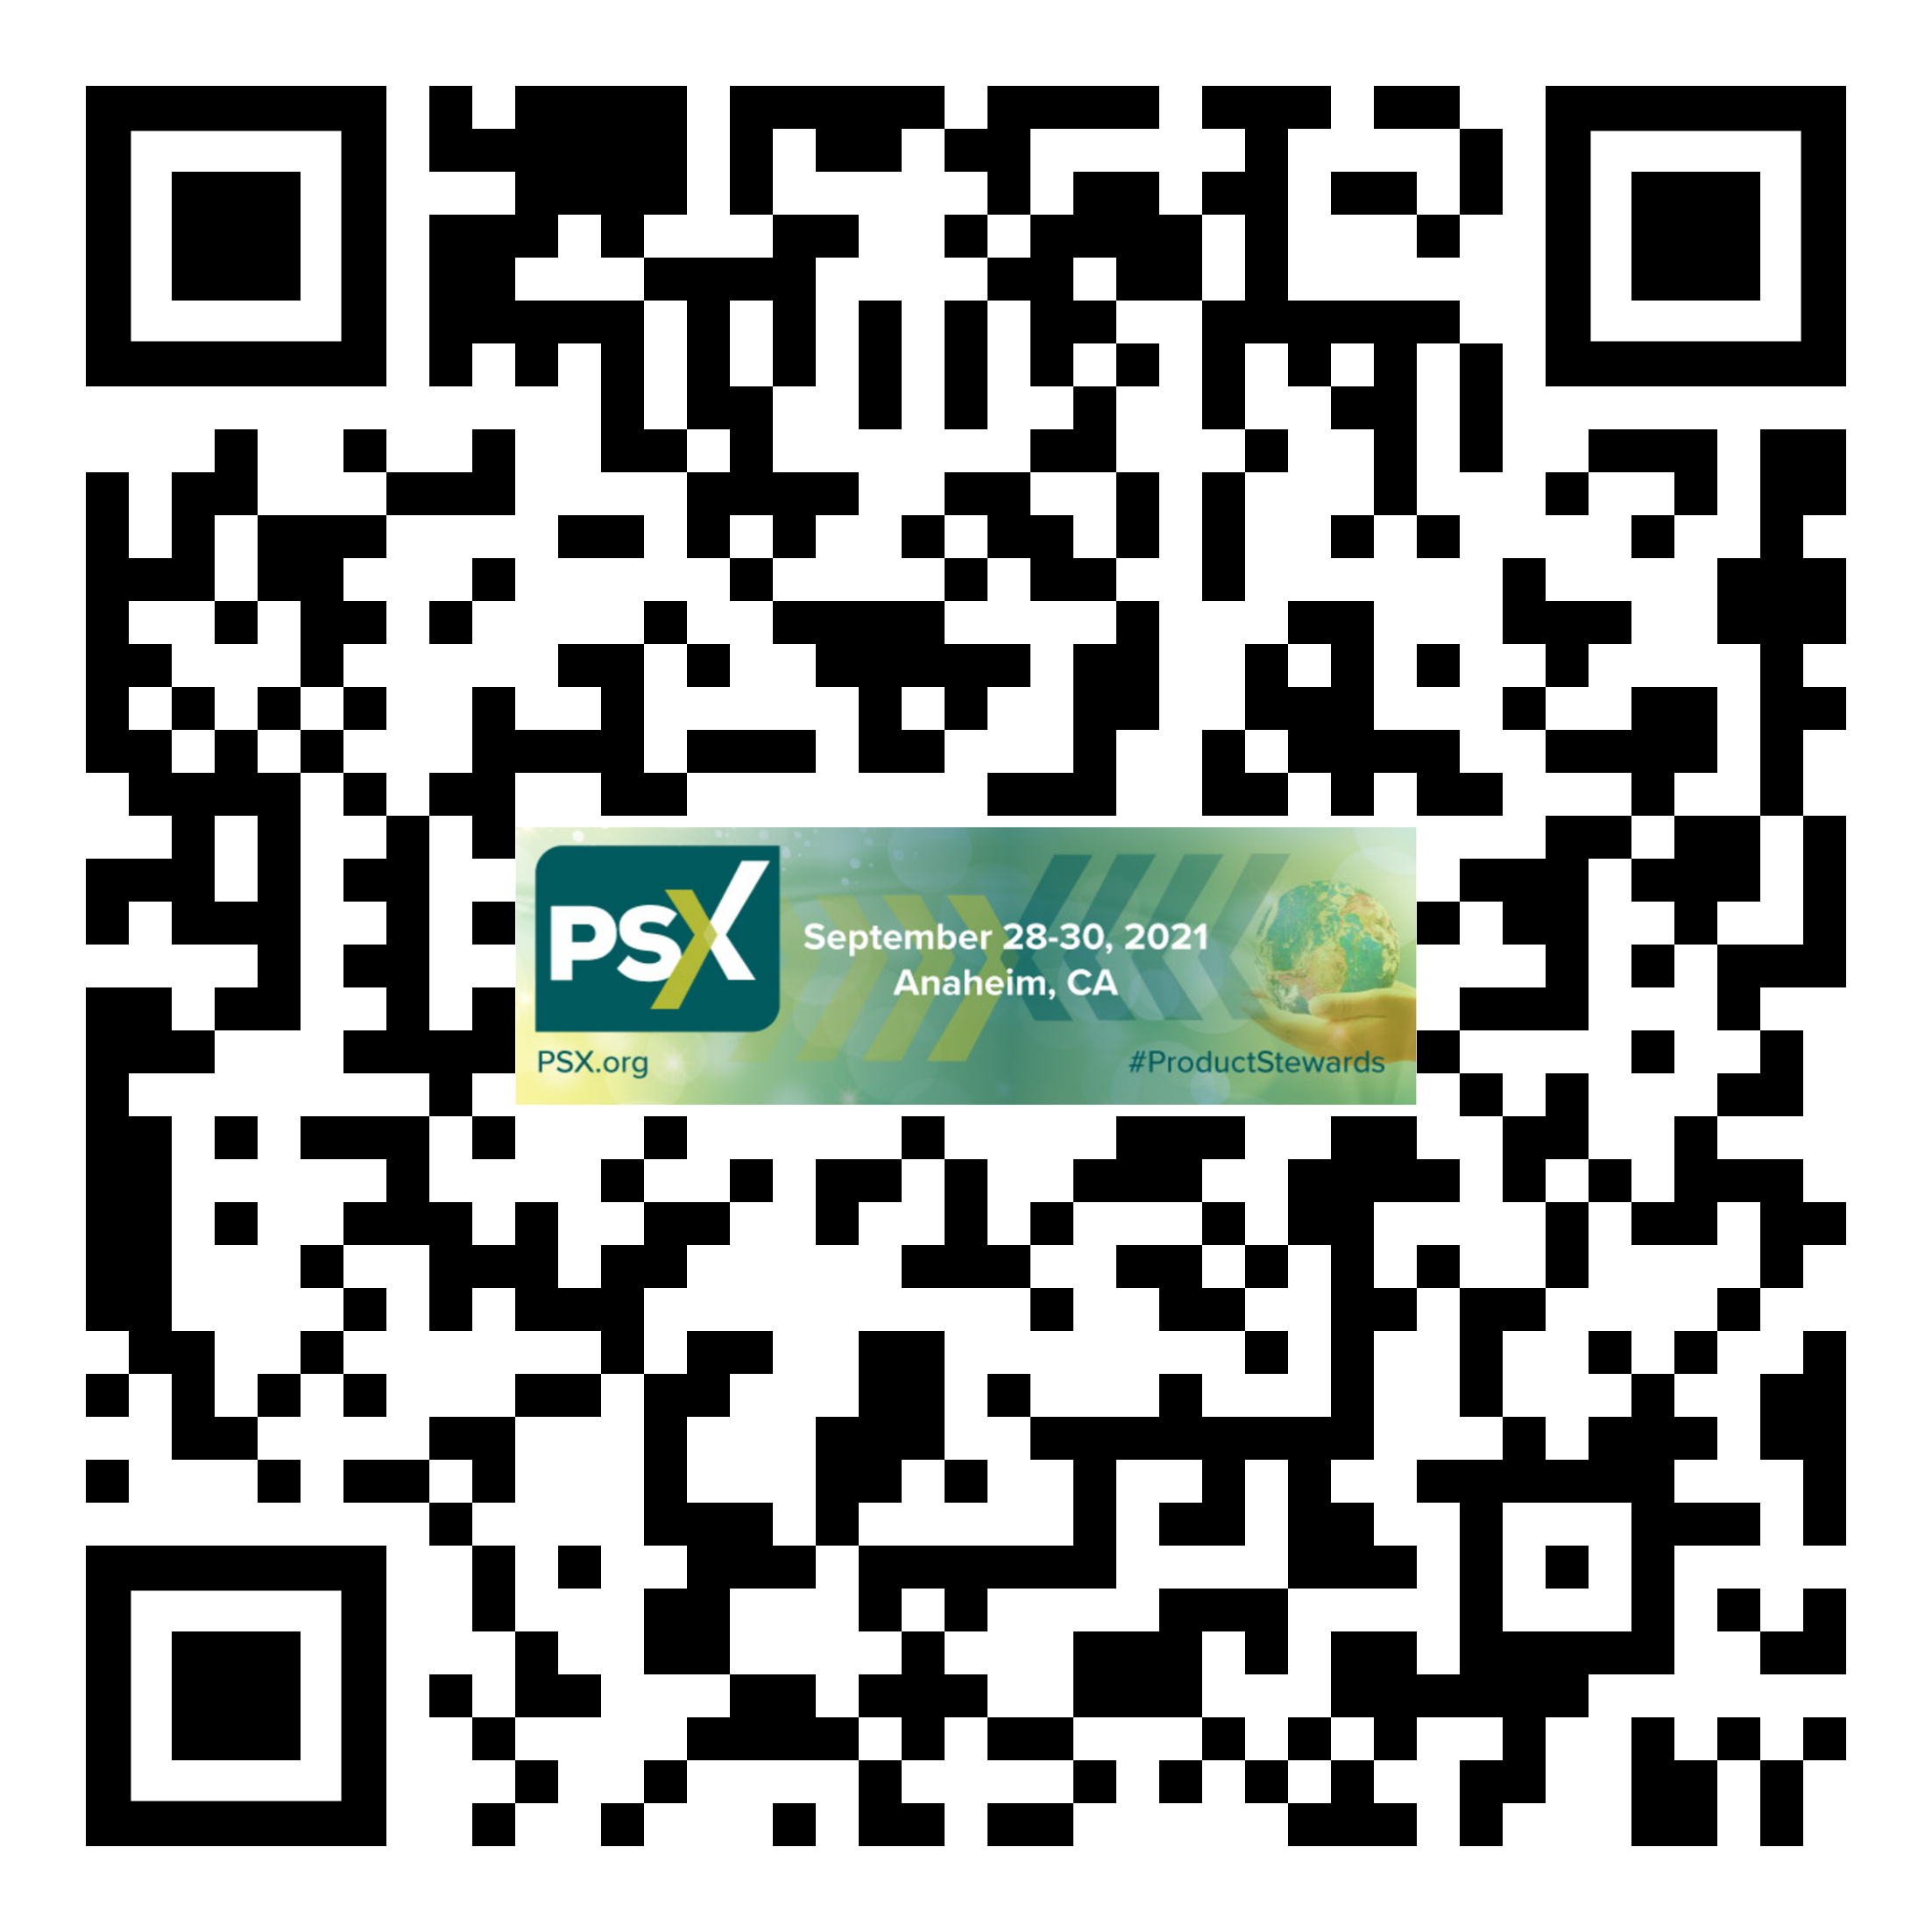 PSX 2021 HealthShield QR Code